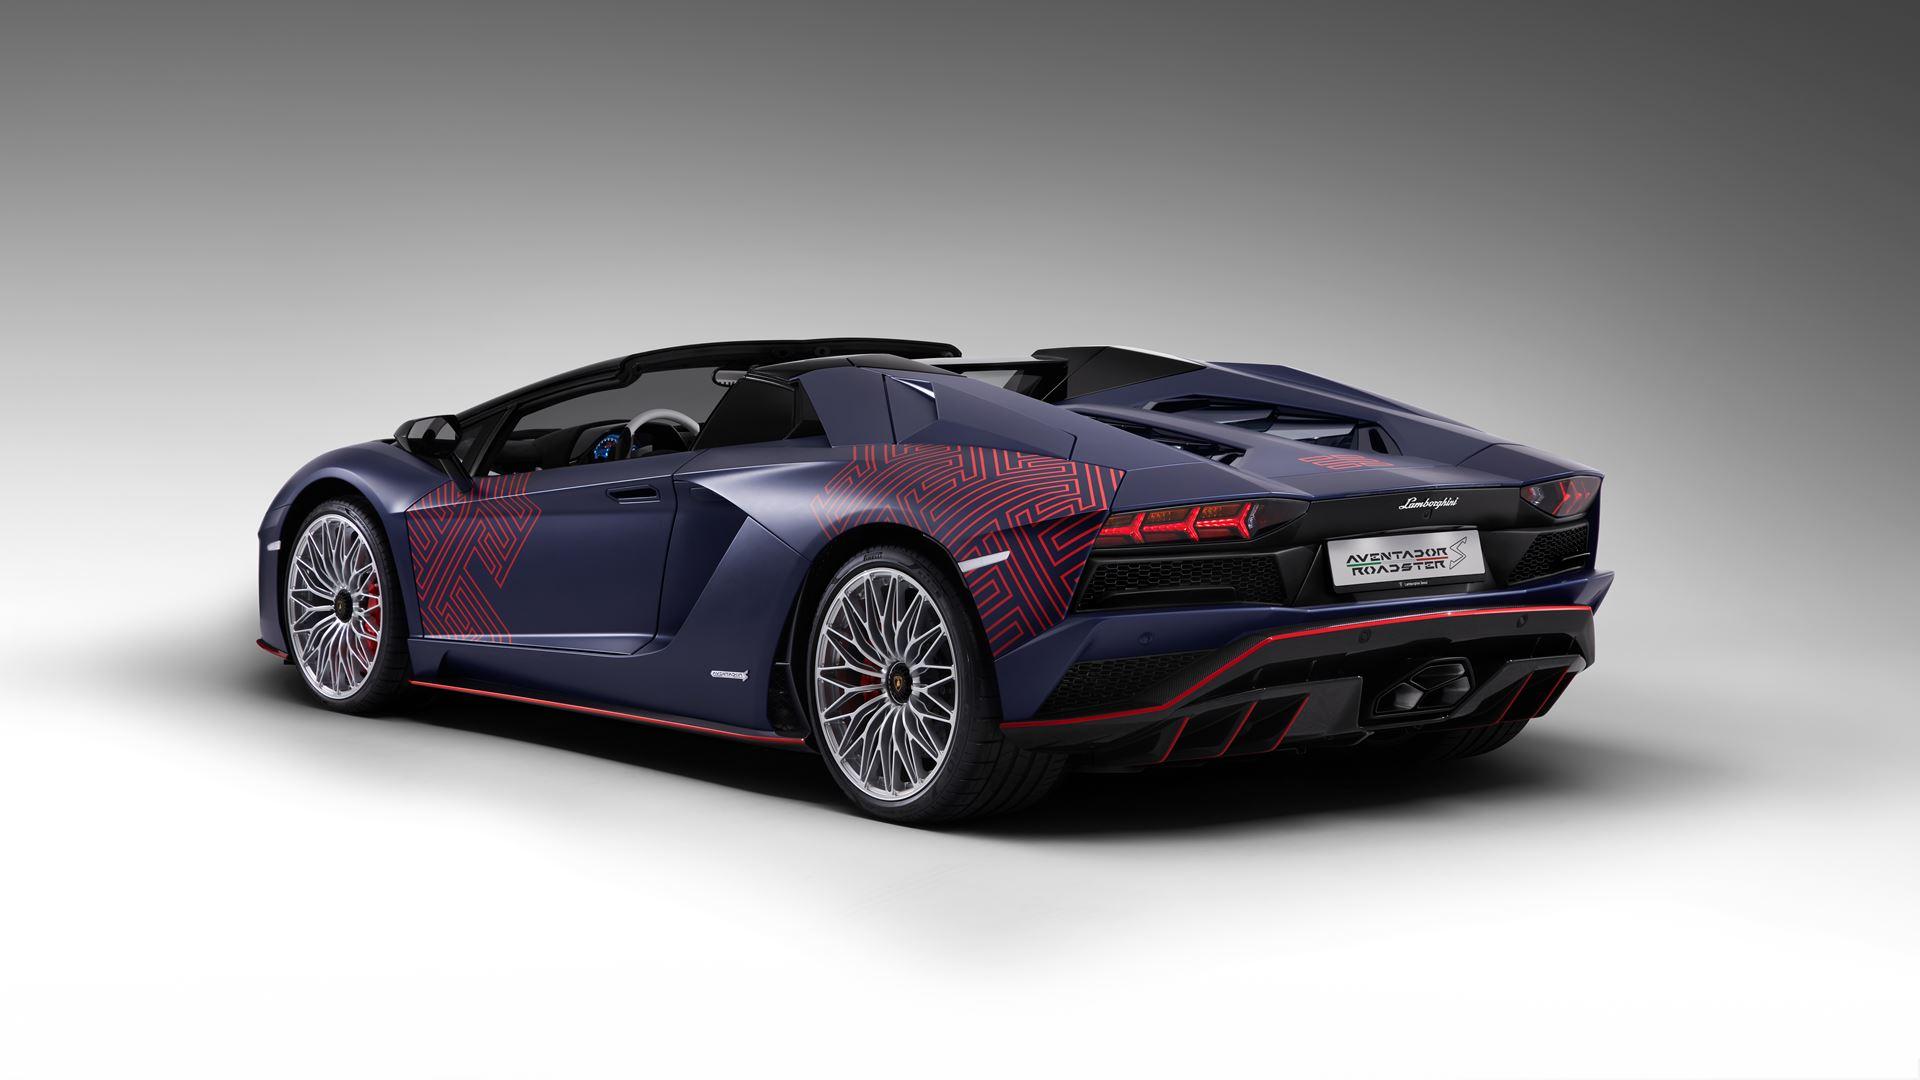 Lamborghini Seoul Unveils the Aventador S Roadster Korean Special Series - Image 1